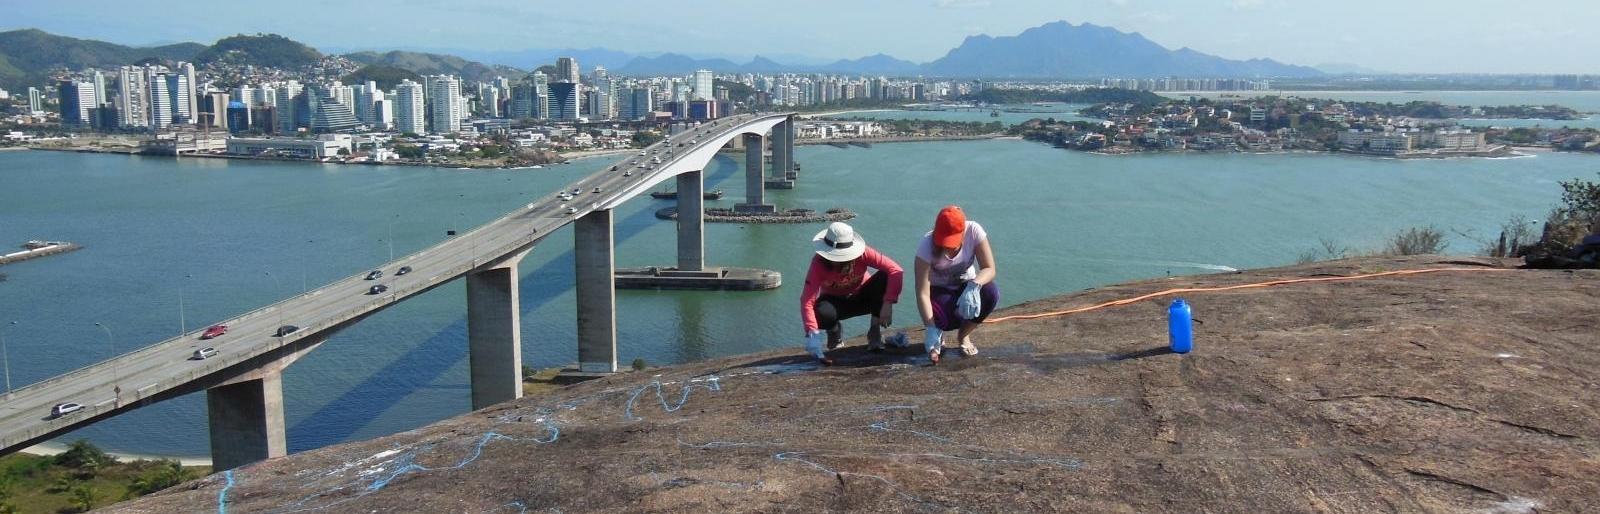 Vila Velha convida para a subida ao Morro do Moreno